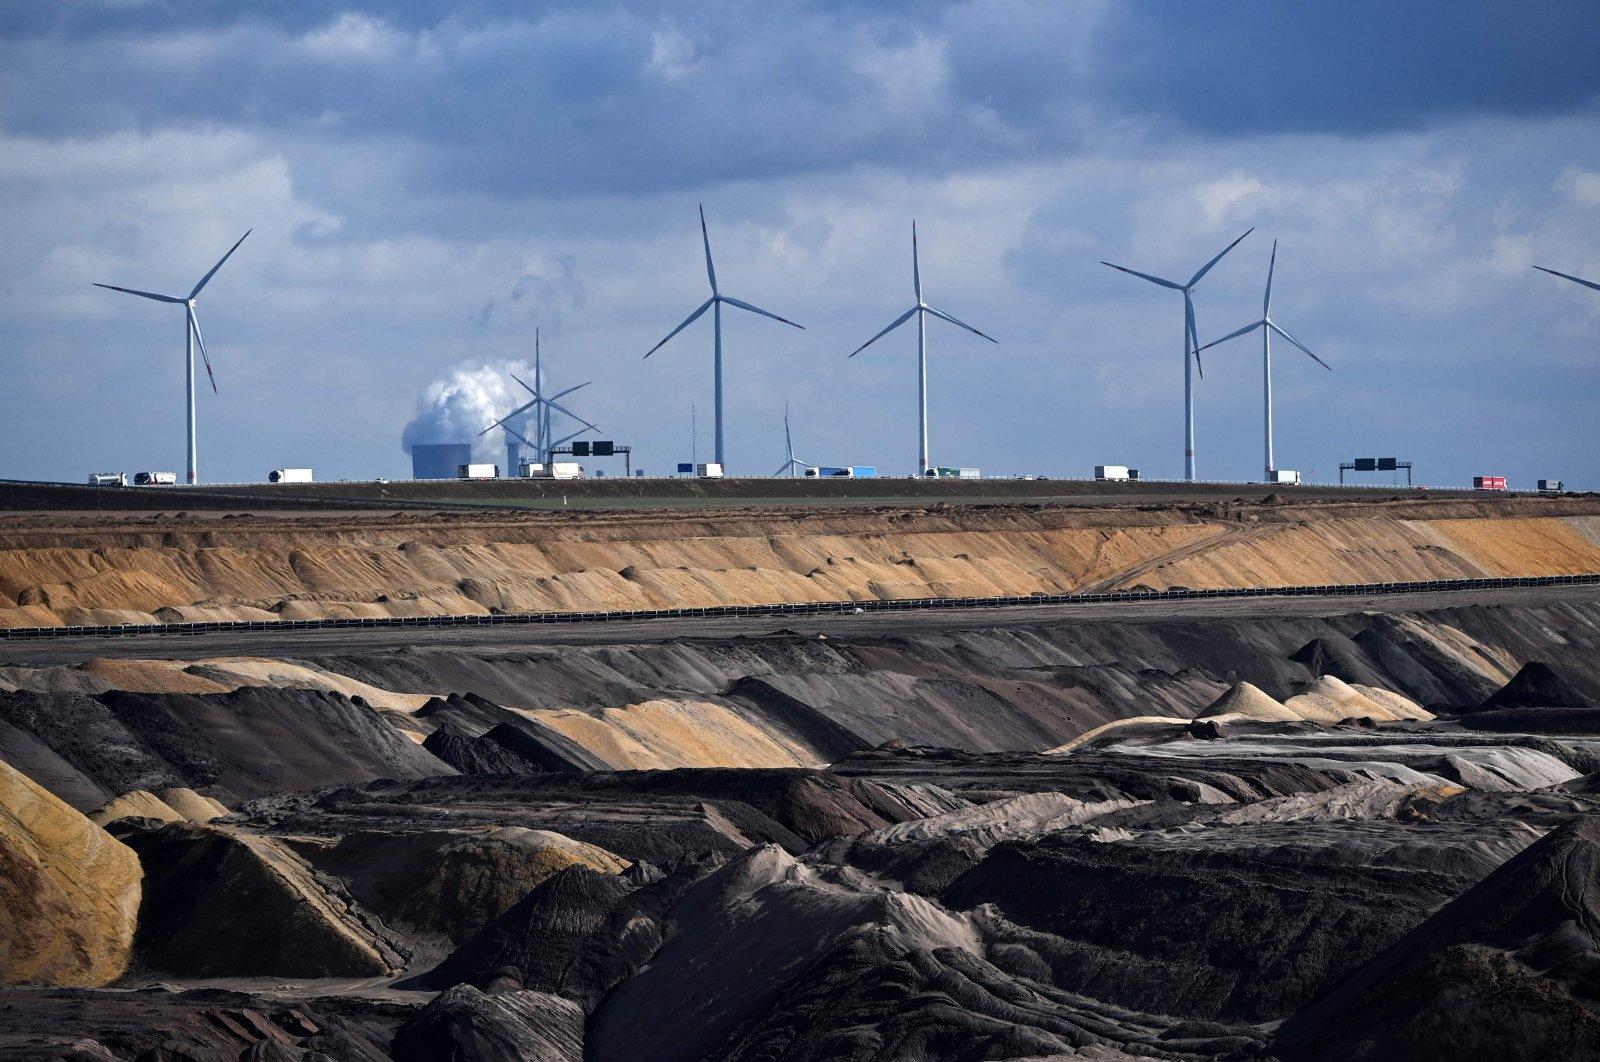 Wind turbines near the open-cast mining of German energy giant RWE in Garzweiler, western Germany, March 15, 2021. (AFP Photo)